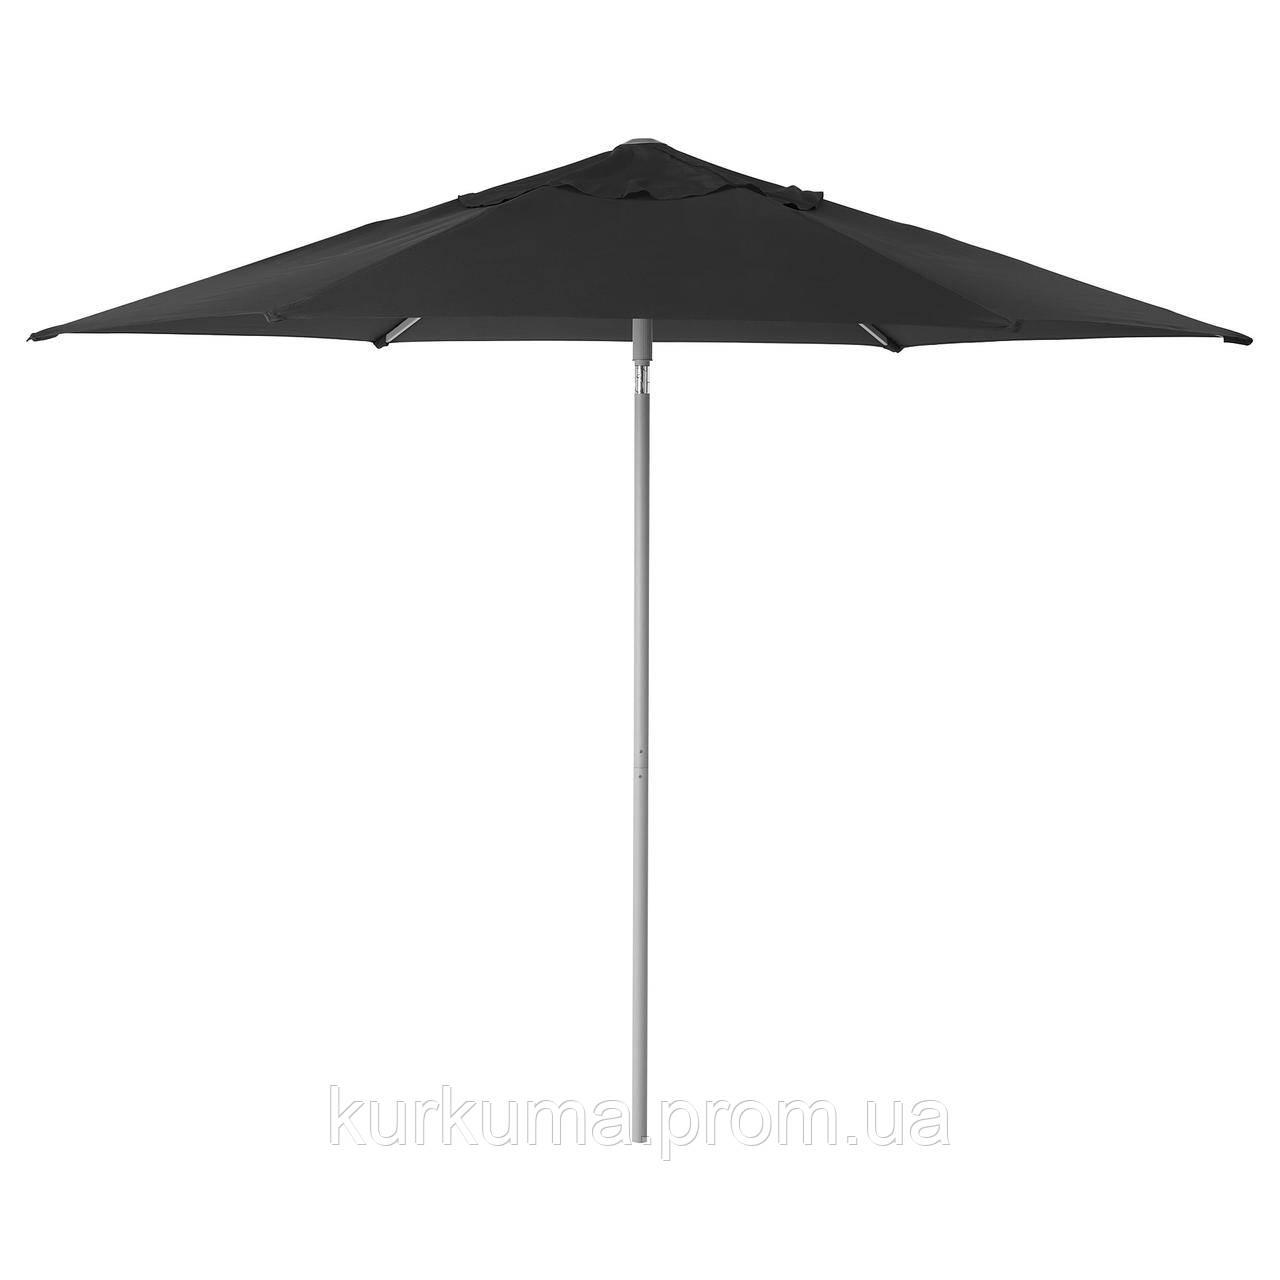 IKEA KUGGO/LINDOJA Зонт, черный  (892.678.02)